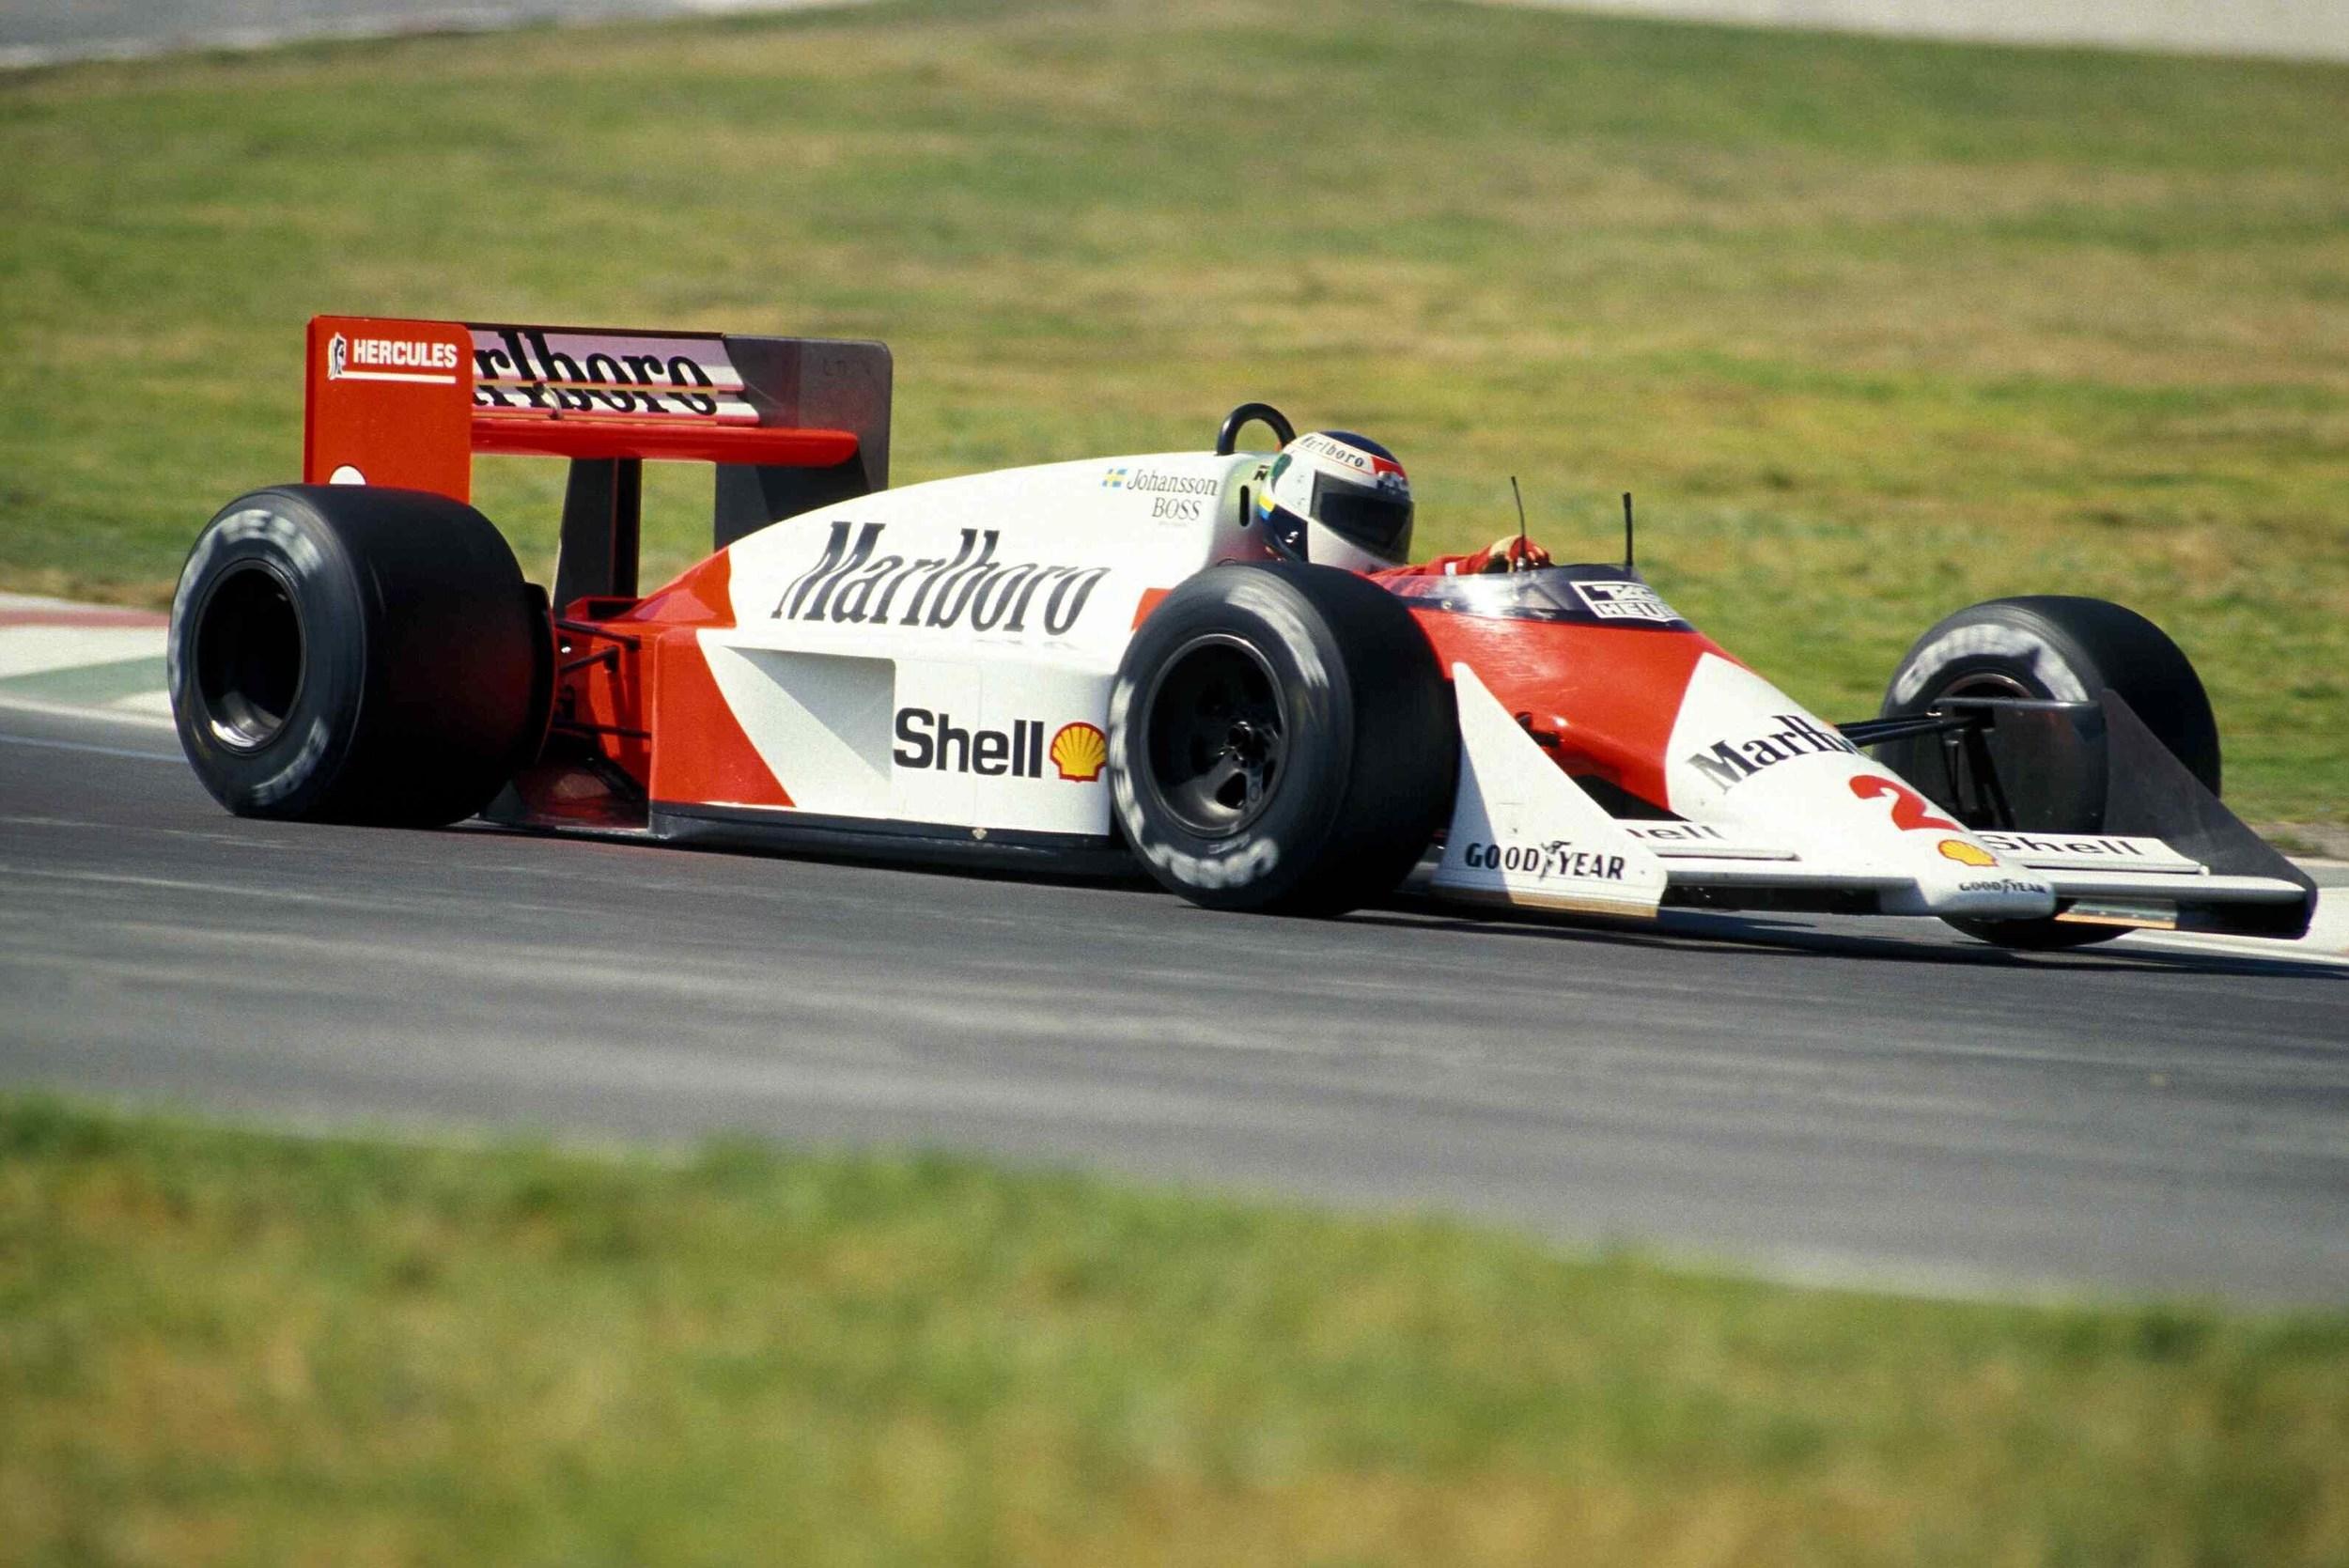 Stefan Johansson - McLaren - Mexican GP 1987